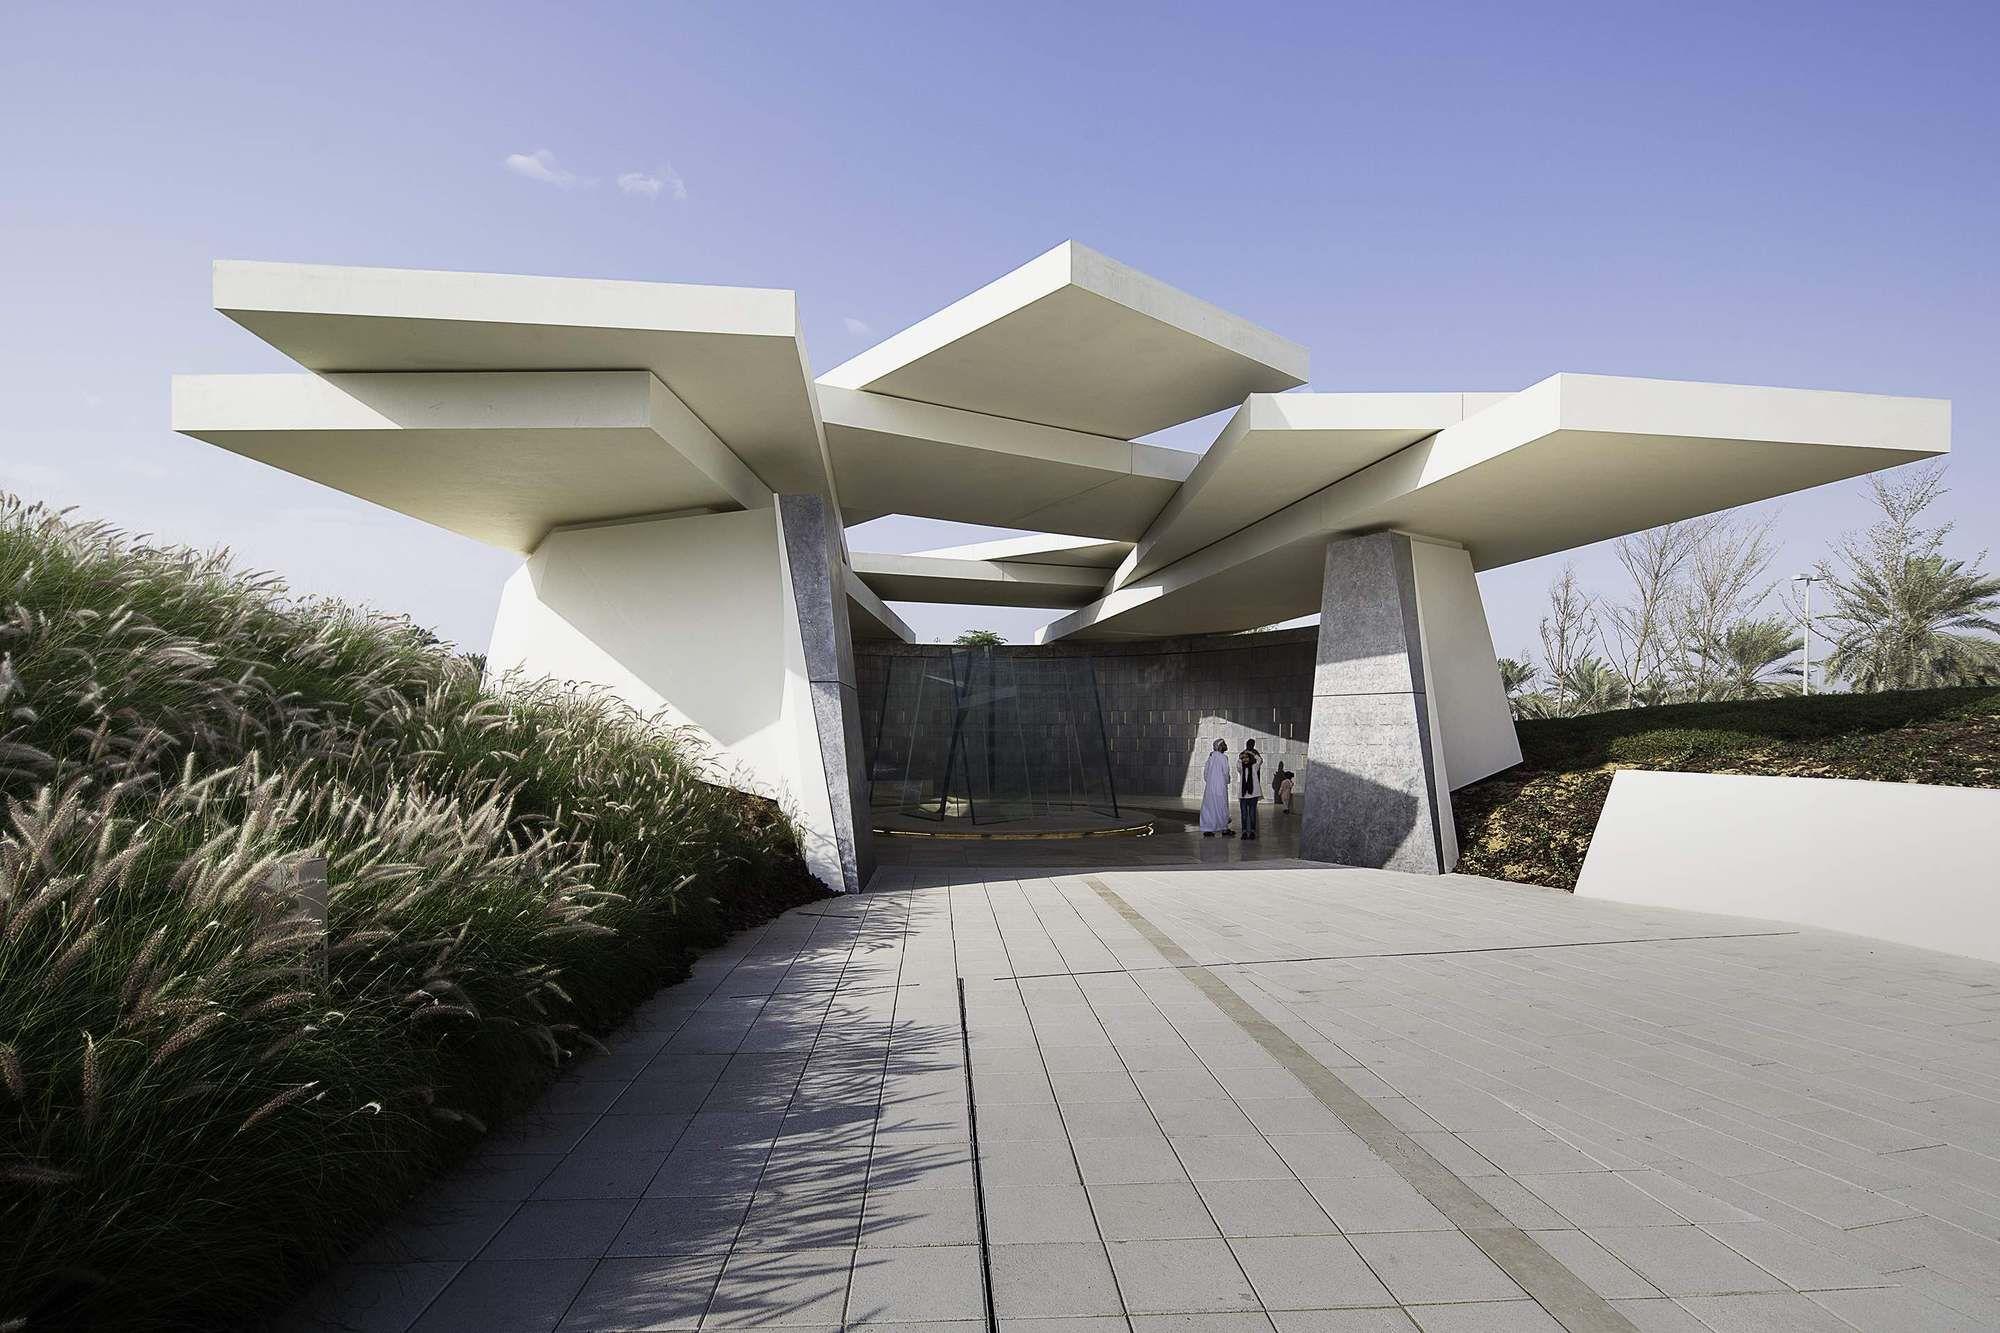 Christ gantenbein named architect of the year at dezeen awards